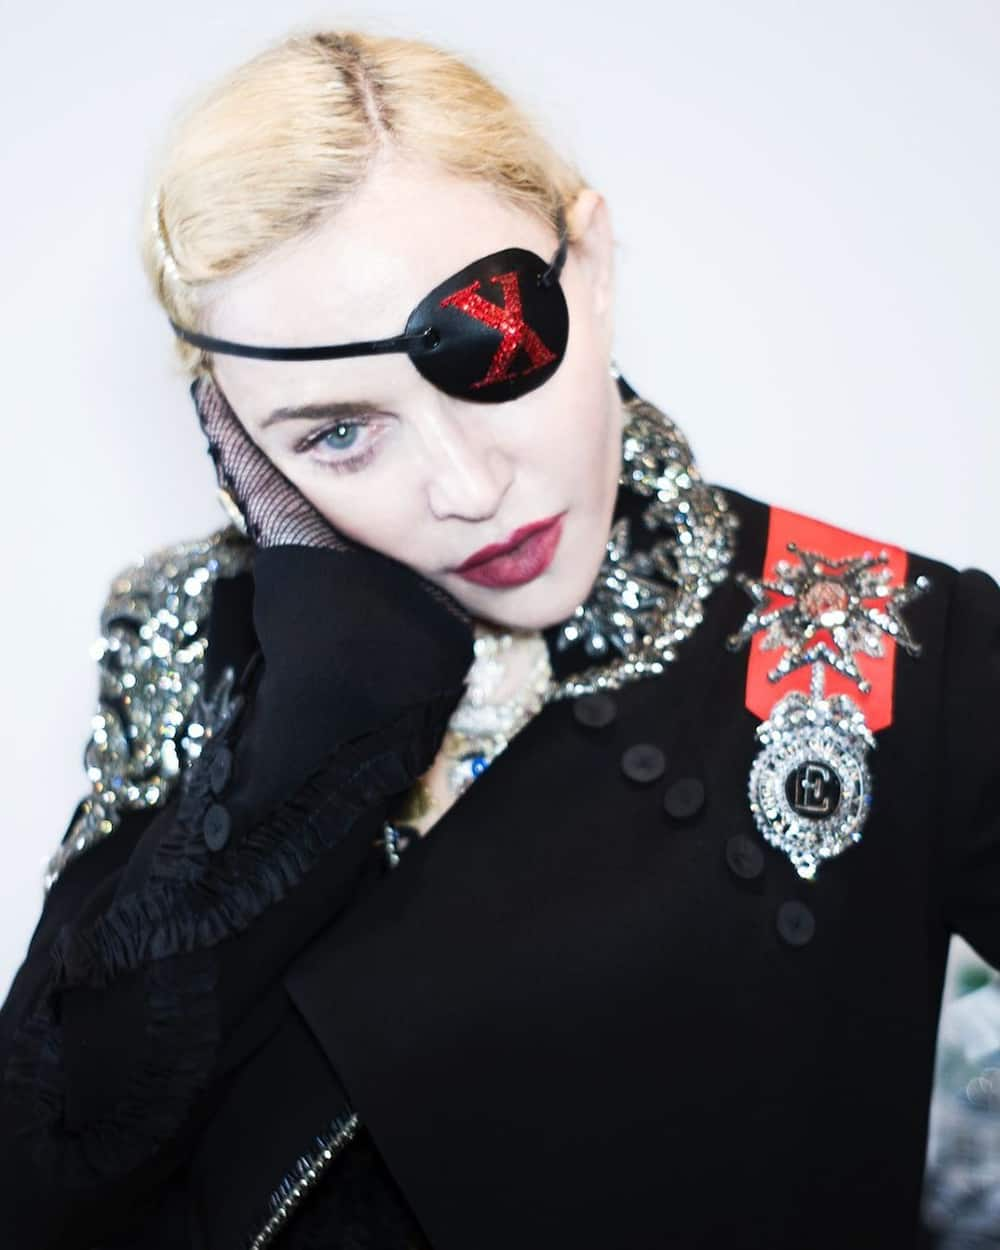 second richest female musician 2019